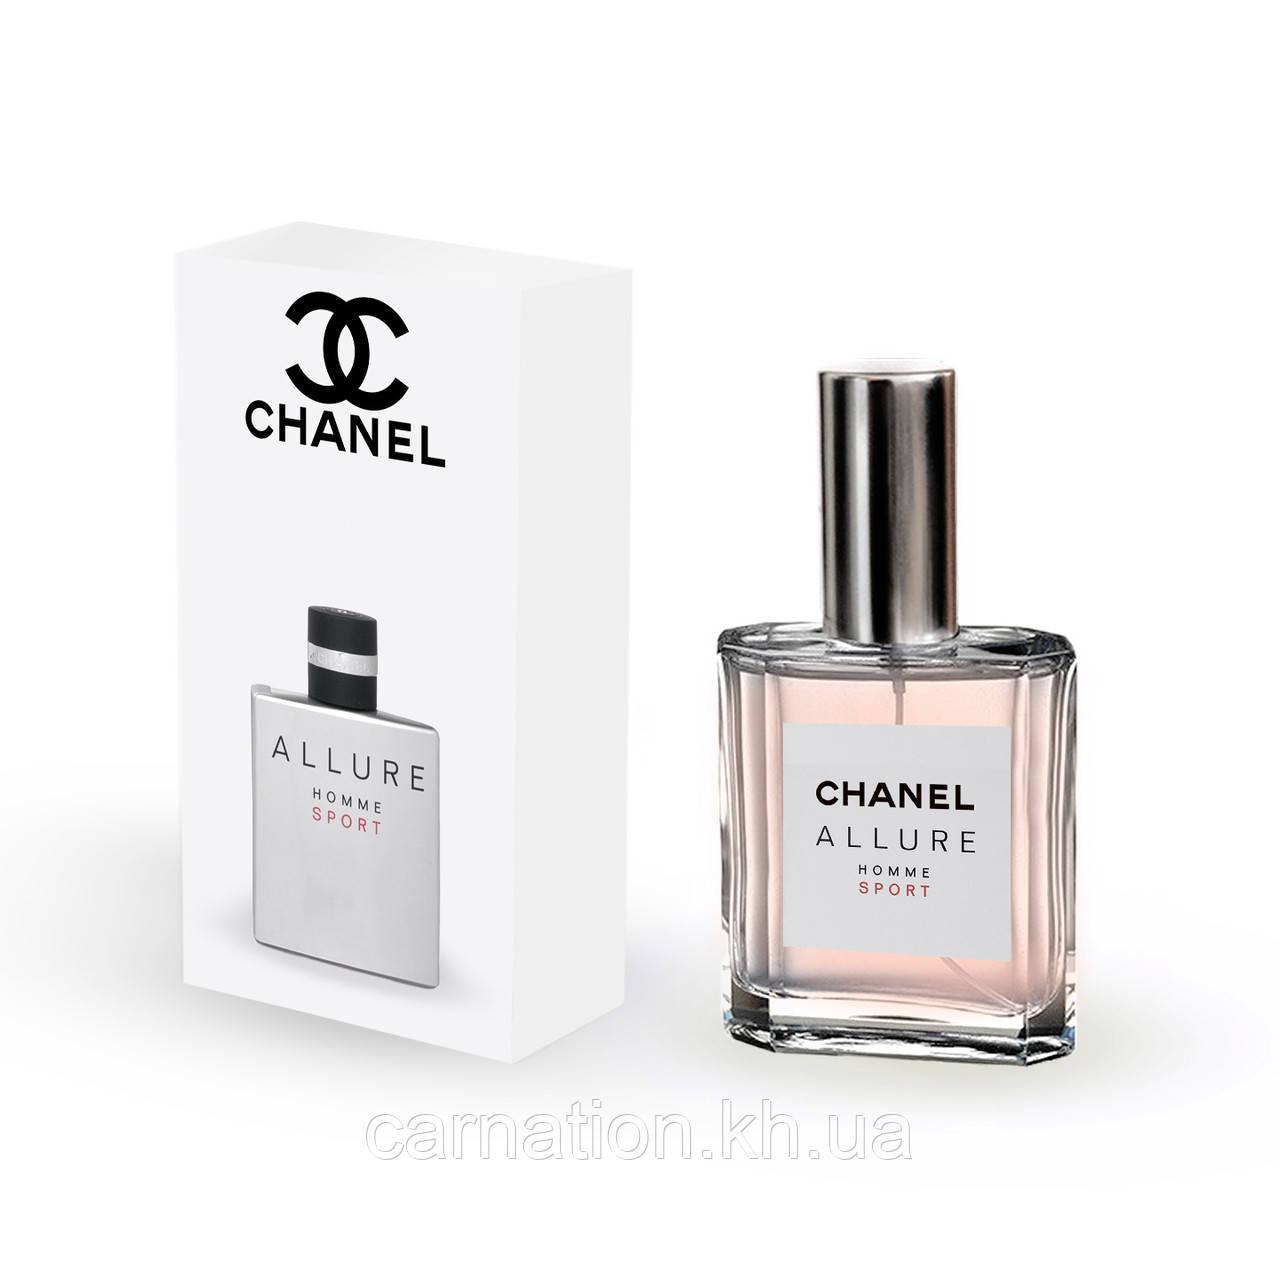 Чоловічий міні парфум Chanel Allure homme Sport 35 мл